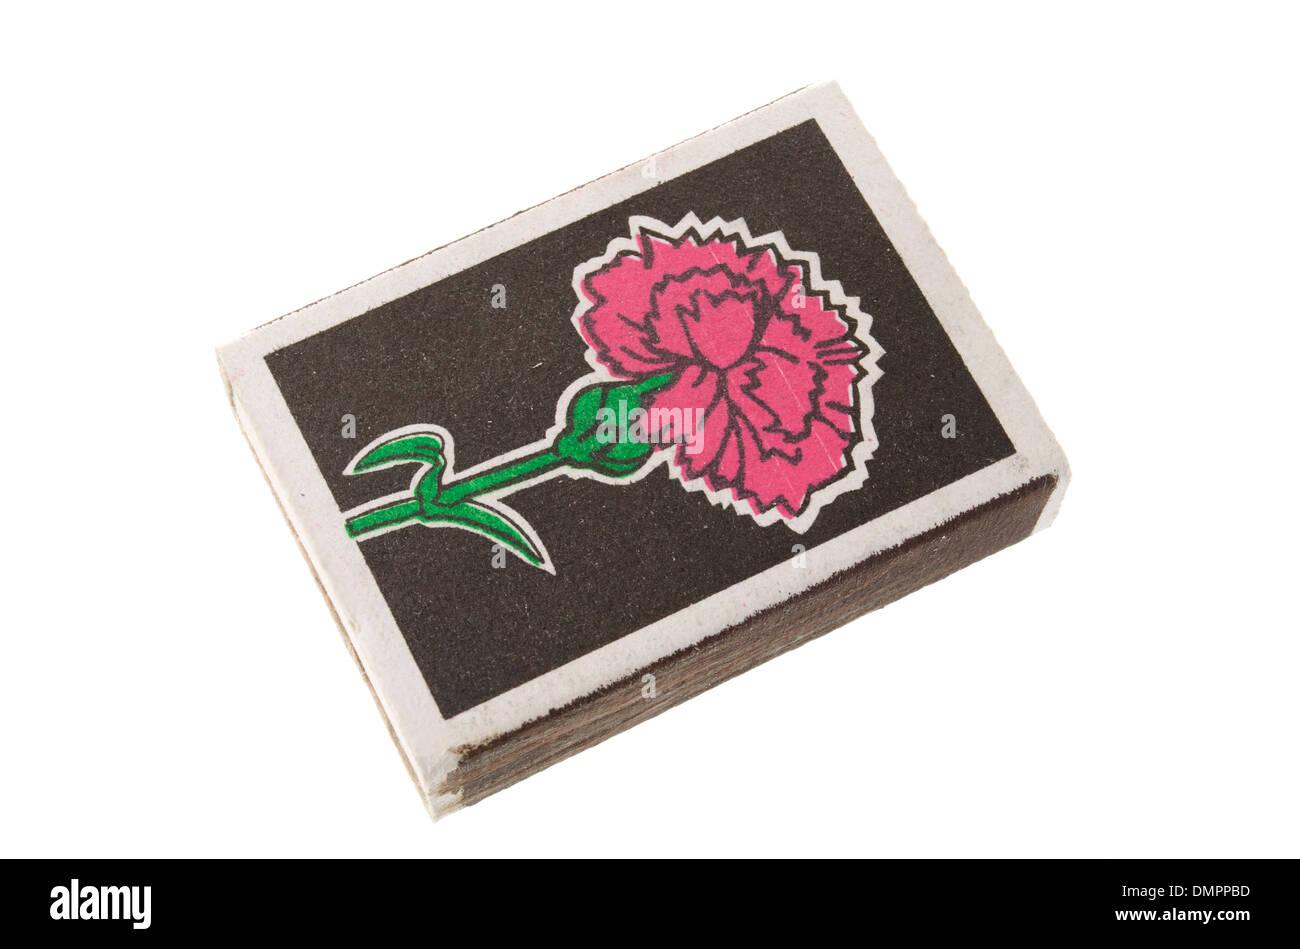 matchbox on a white background - Stock Image